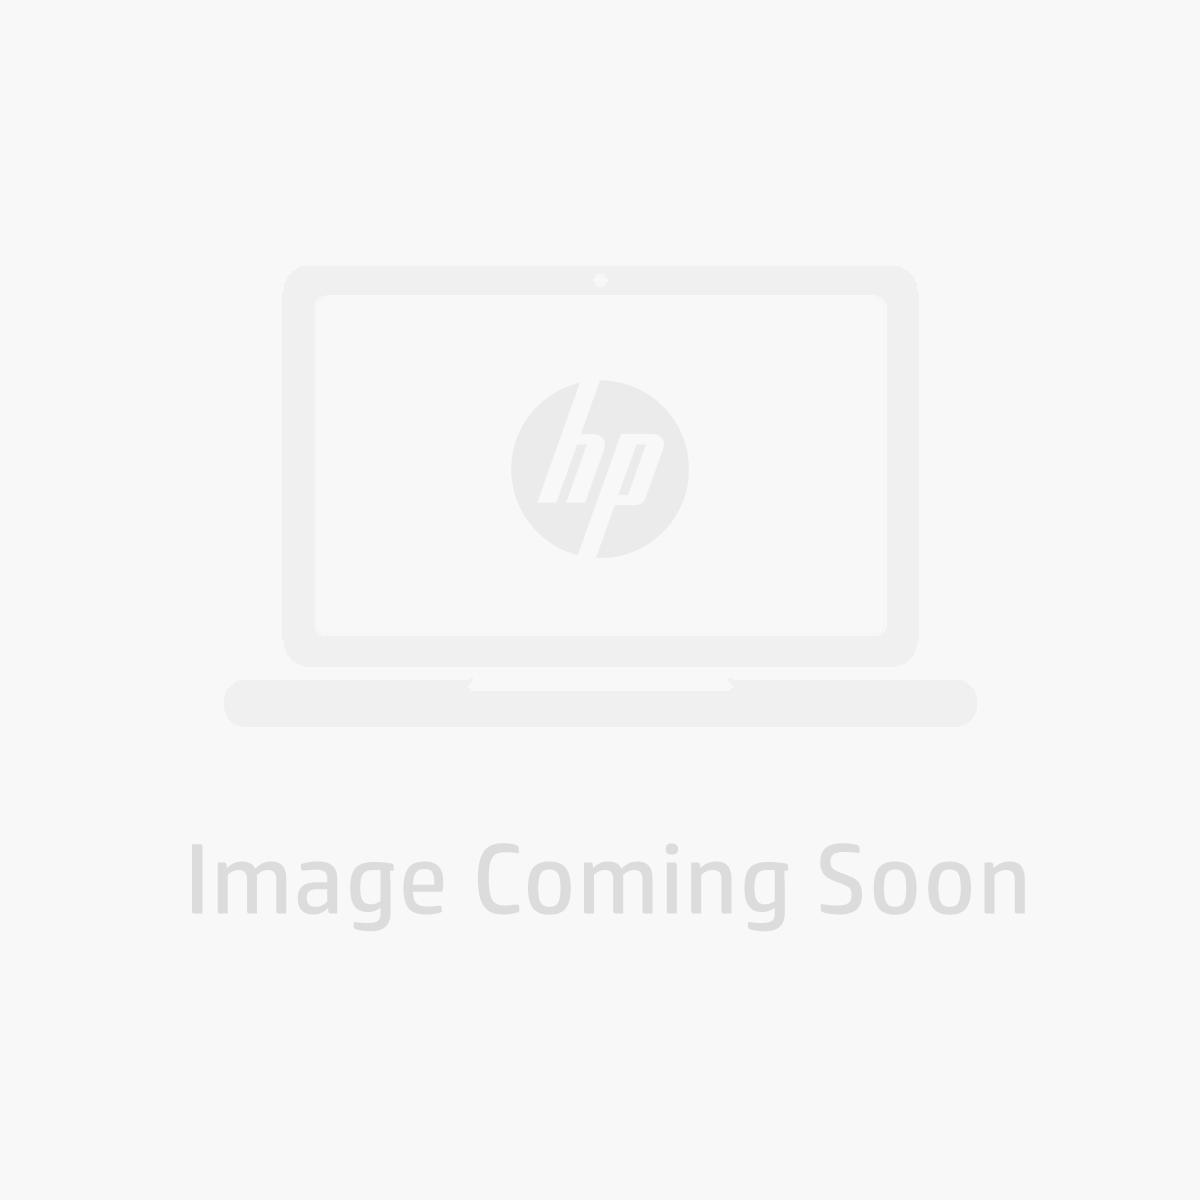 HP 05L Economy Black Original LaserJet Toner Cartridge